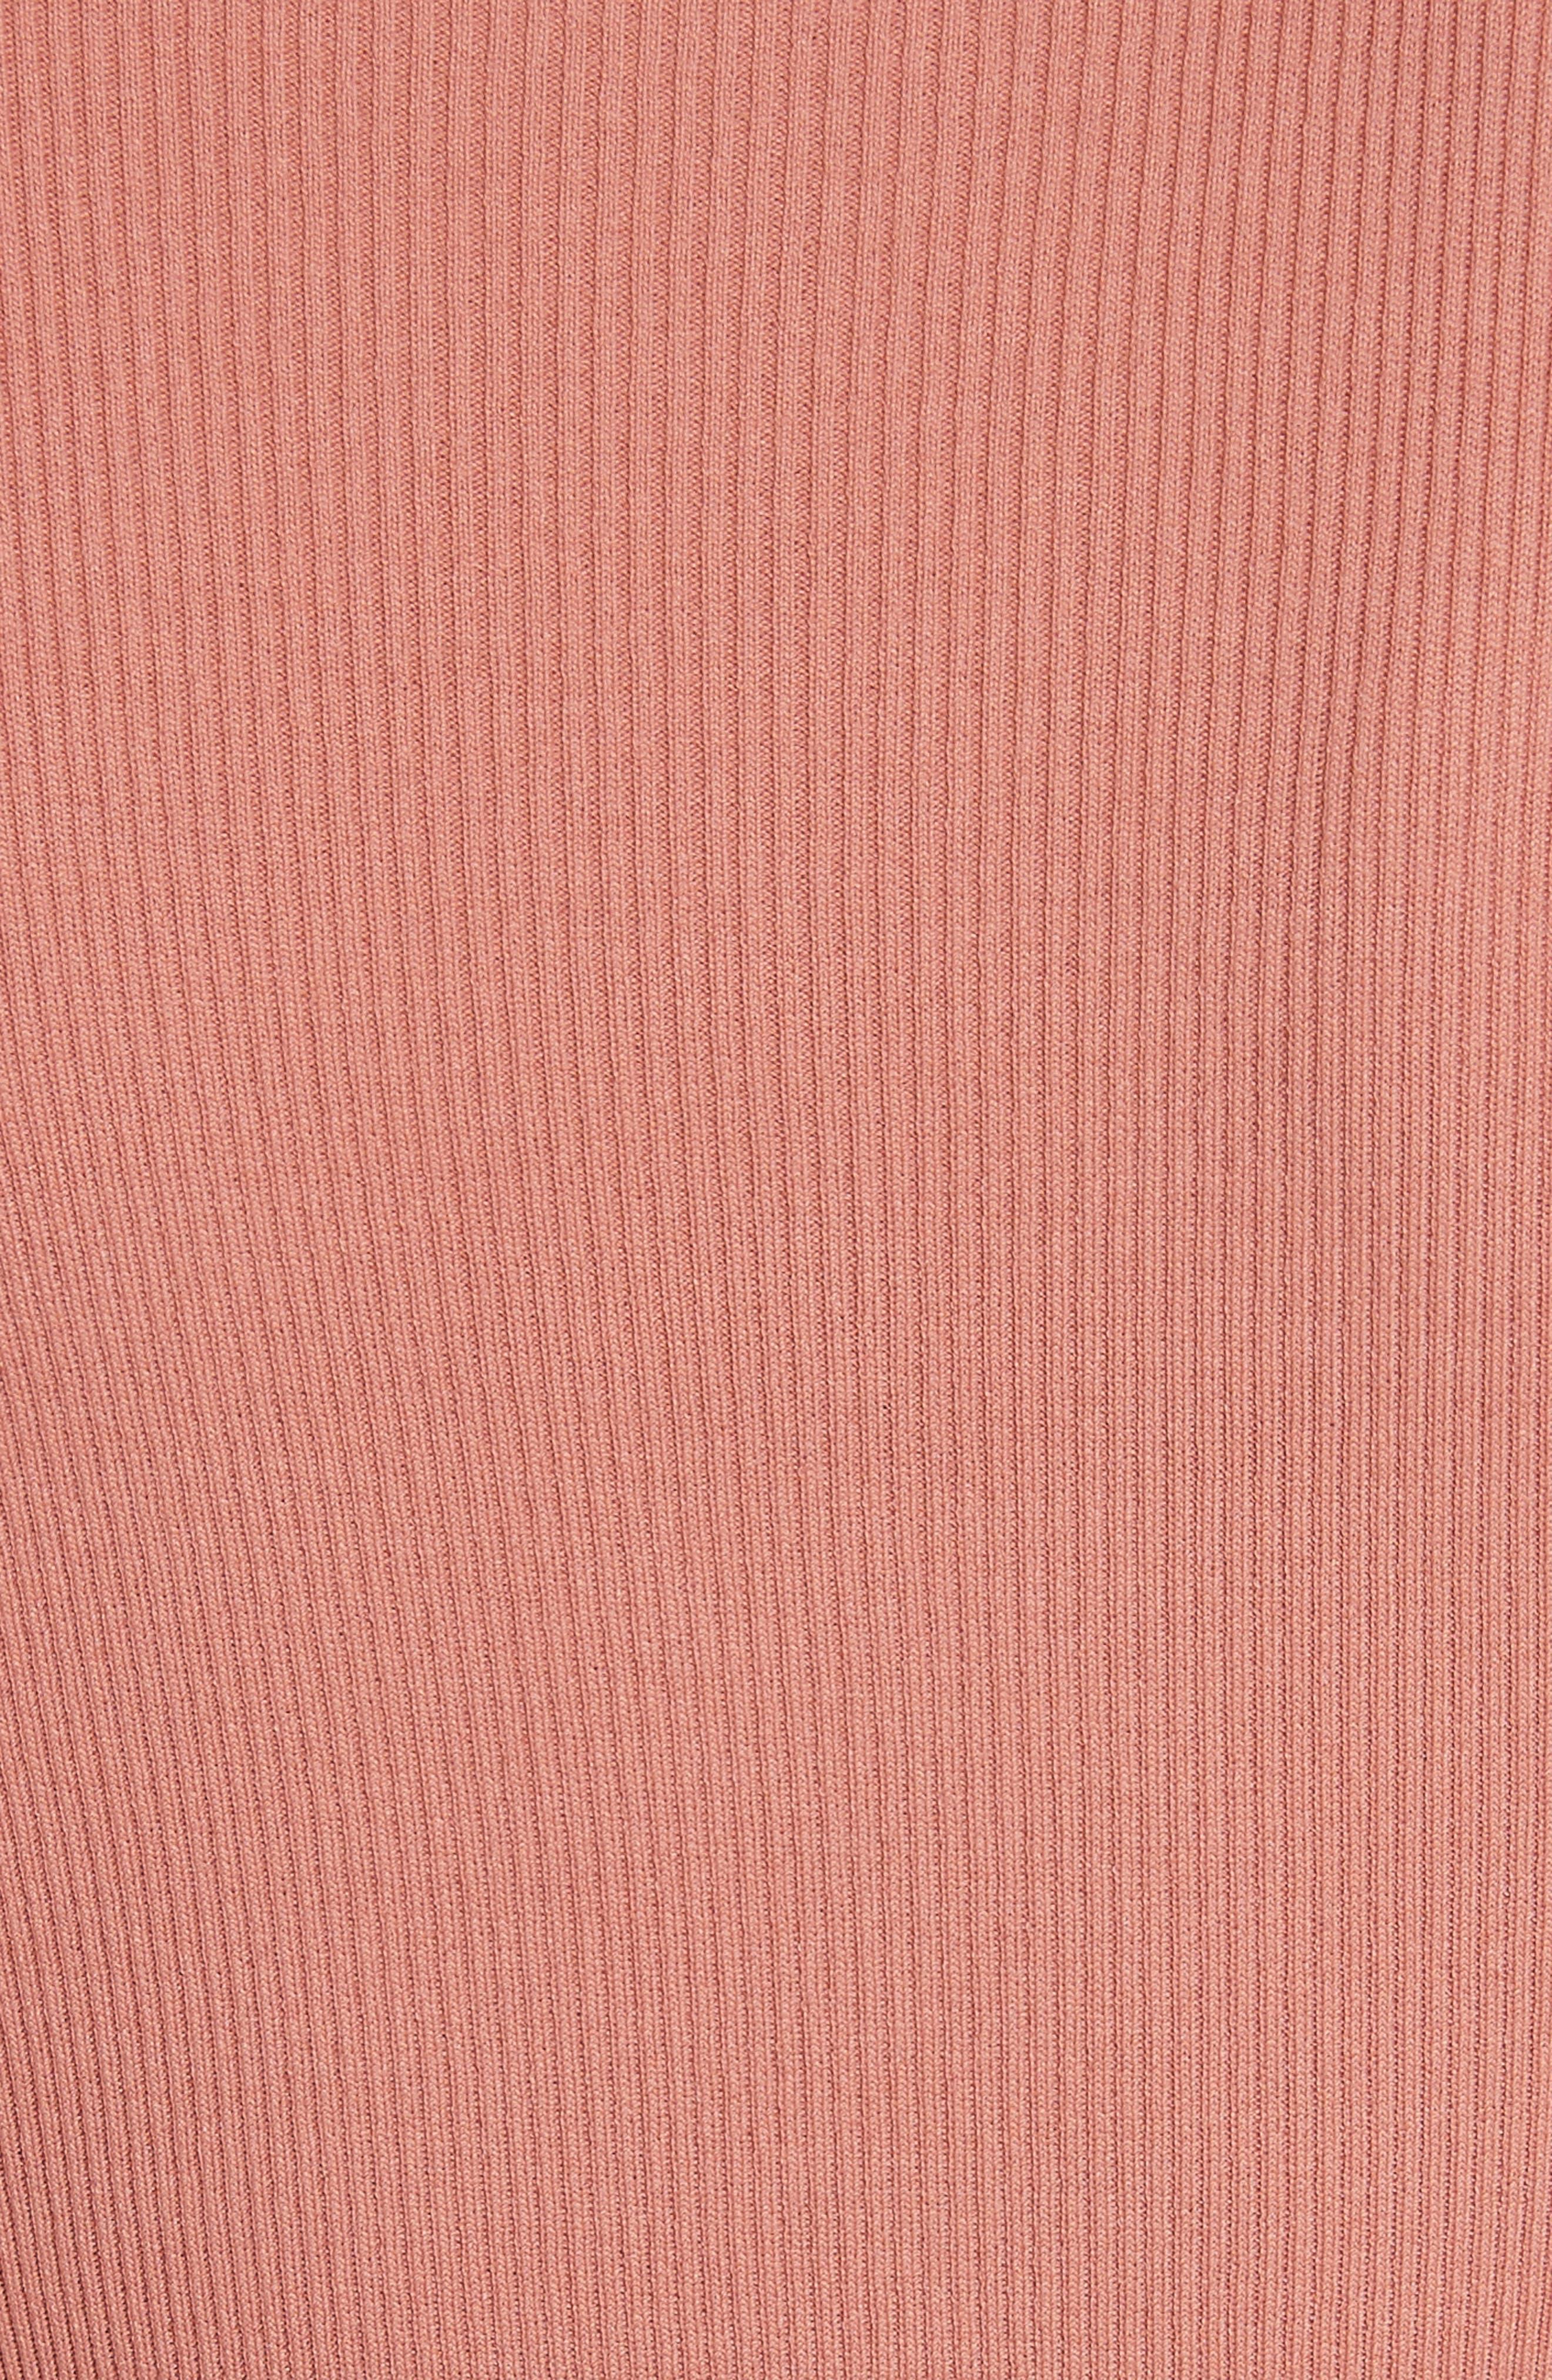 Scallop Stretch Knit Dress,                             Alternate thumbnail 5, color,